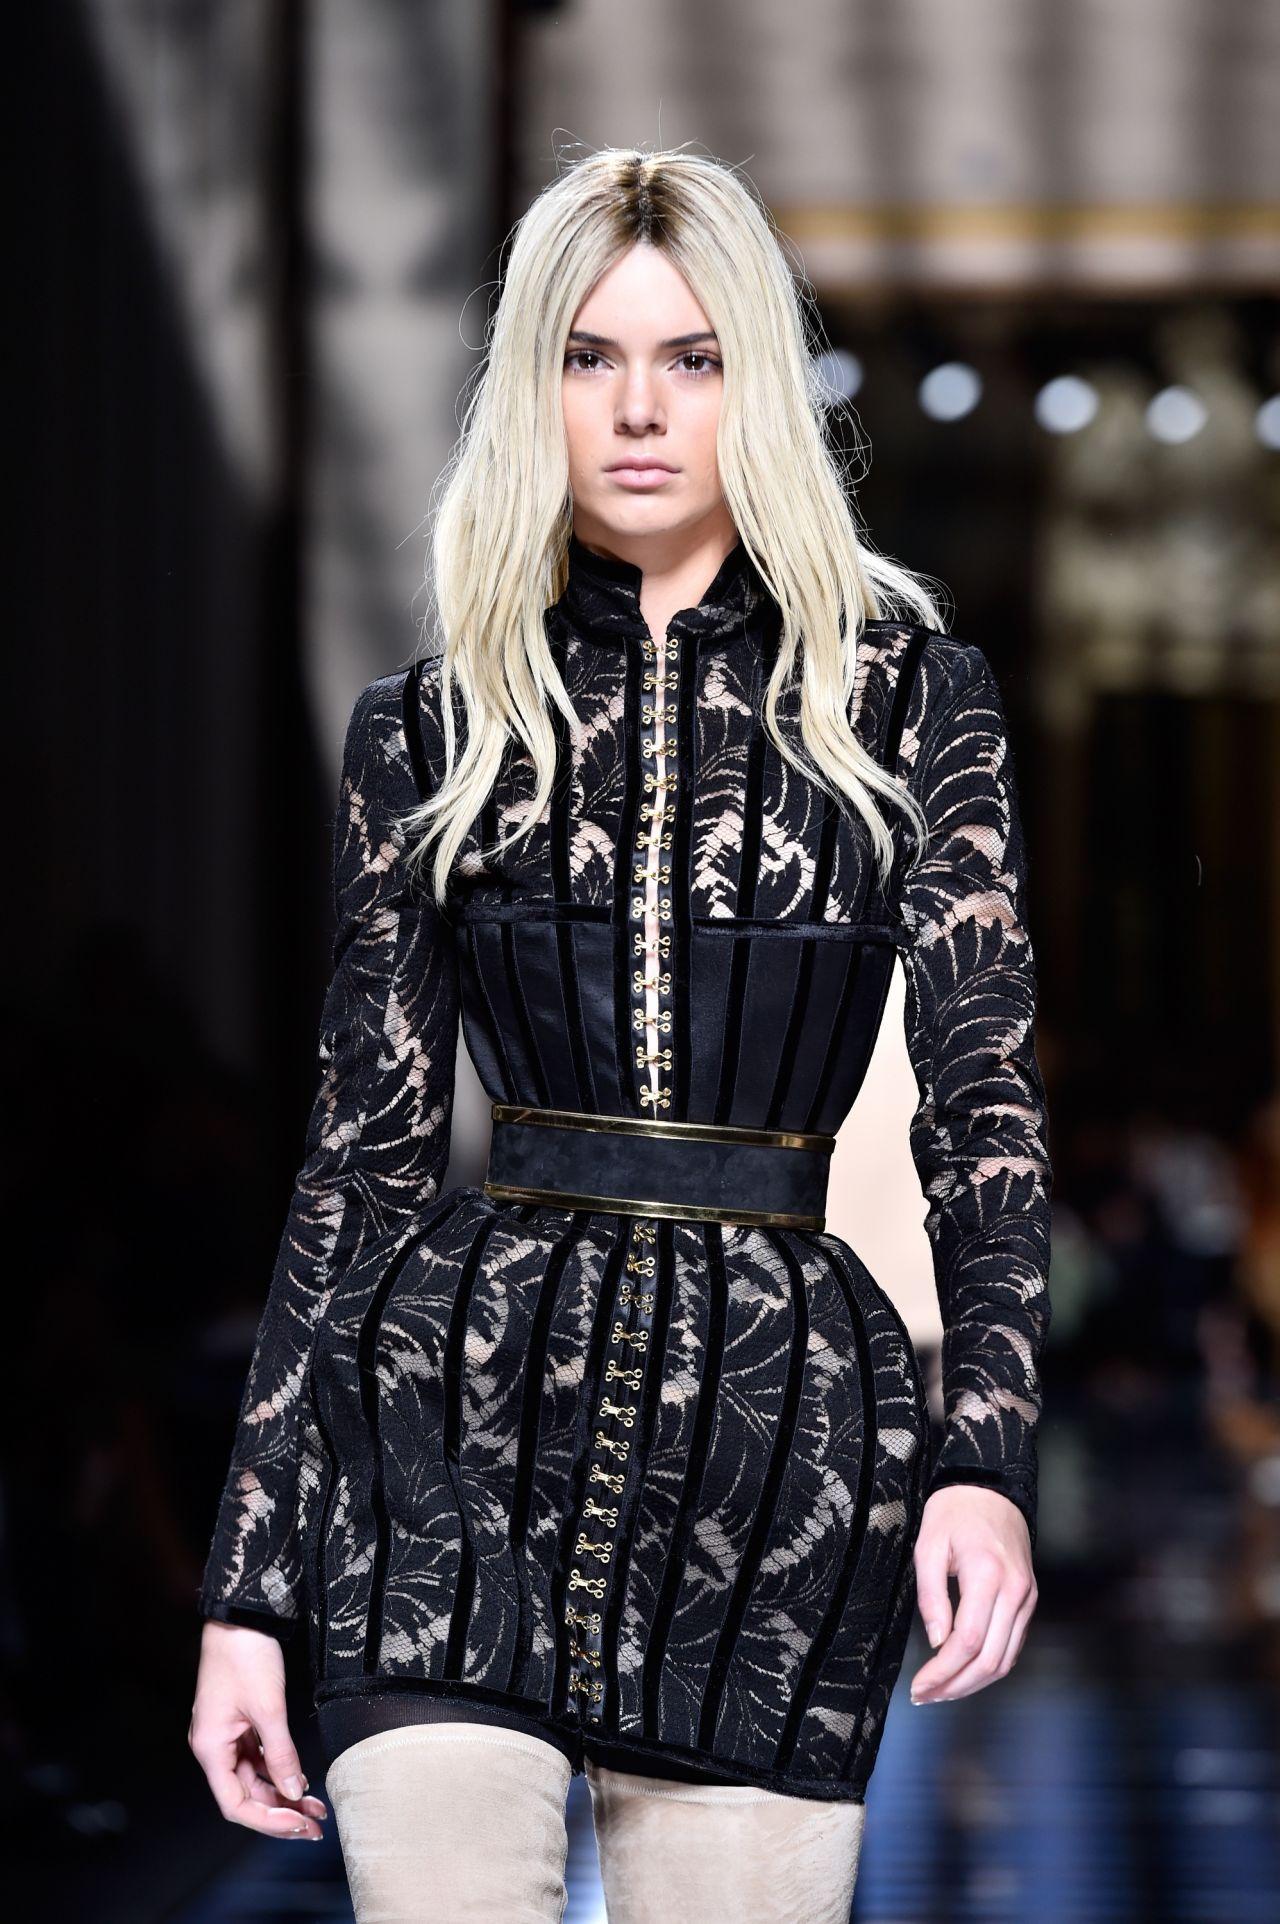 Kendall Jenner Balmain Fashion Show Paris Fashion Week 3 3 2016